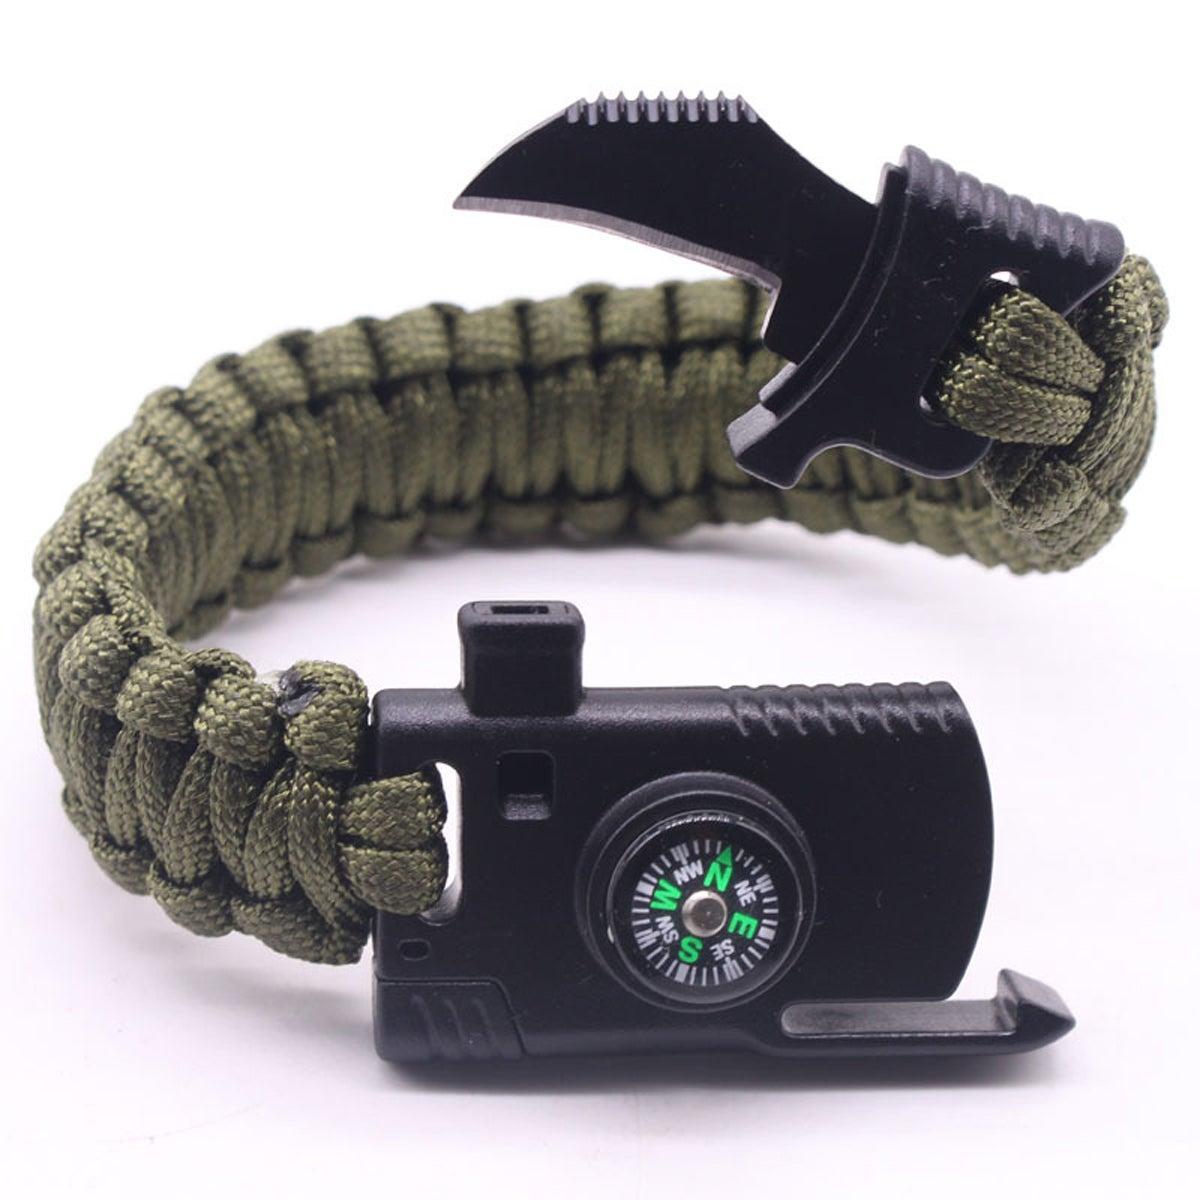 Image of Knife Multi Tool Survival Bracelet, 2 Sizes